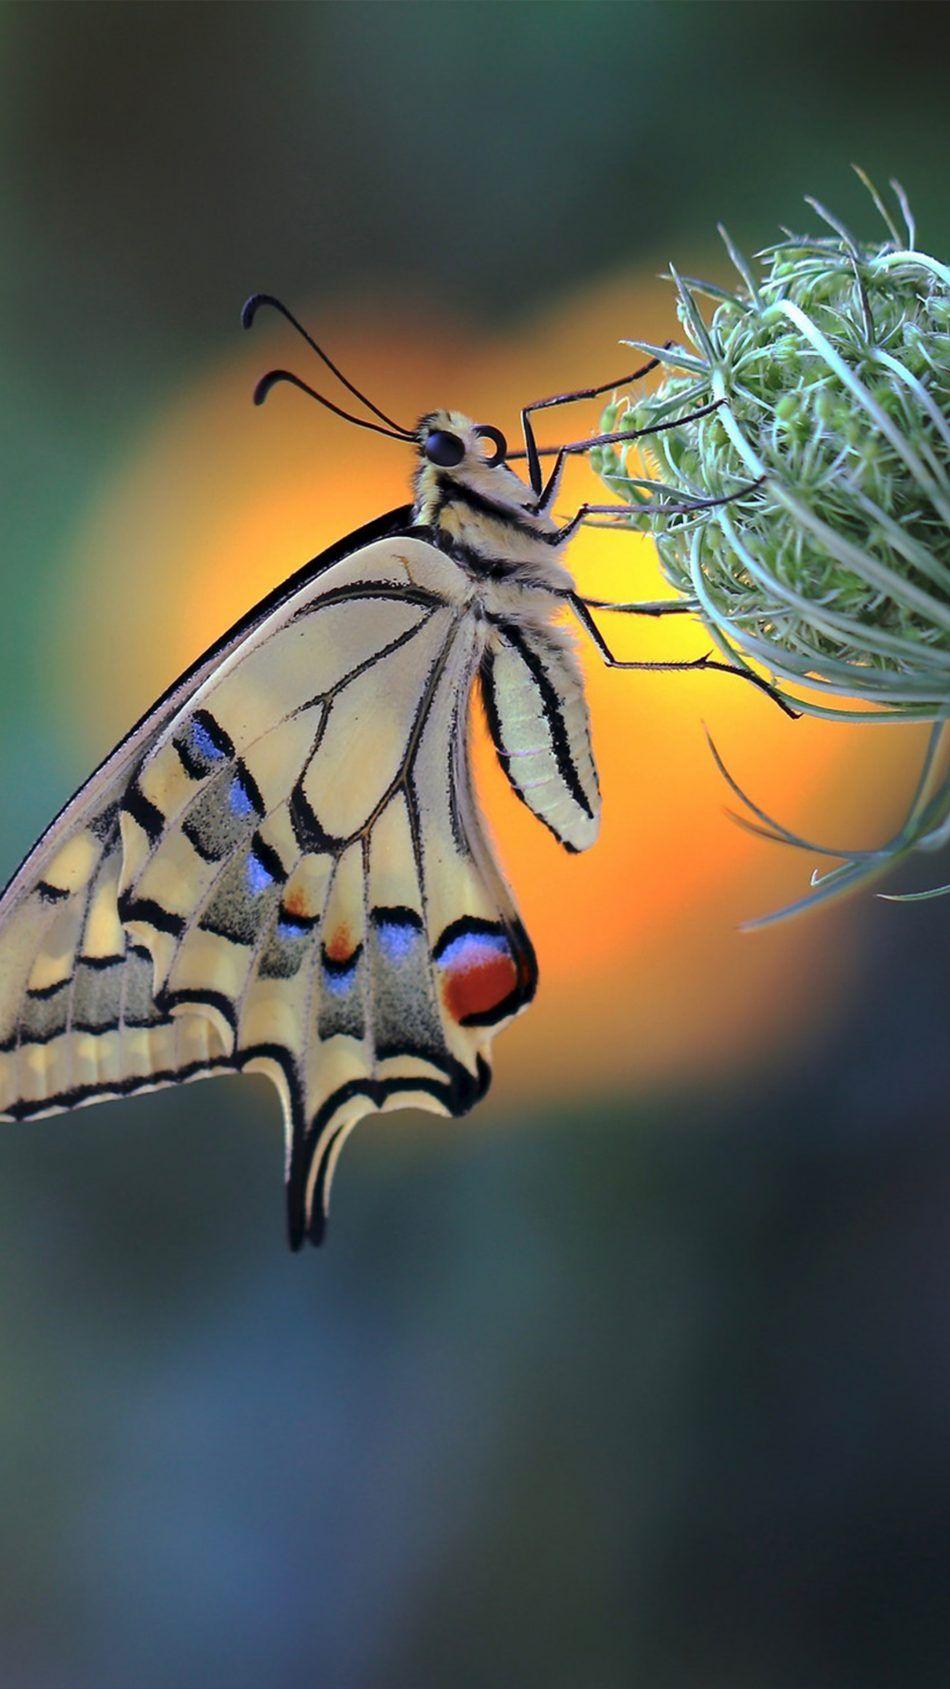 Butterfly Insect Flower Macro 4k Ultra Hd Mobile Wallpaper Insects Beautiful Butterflies Butterfly